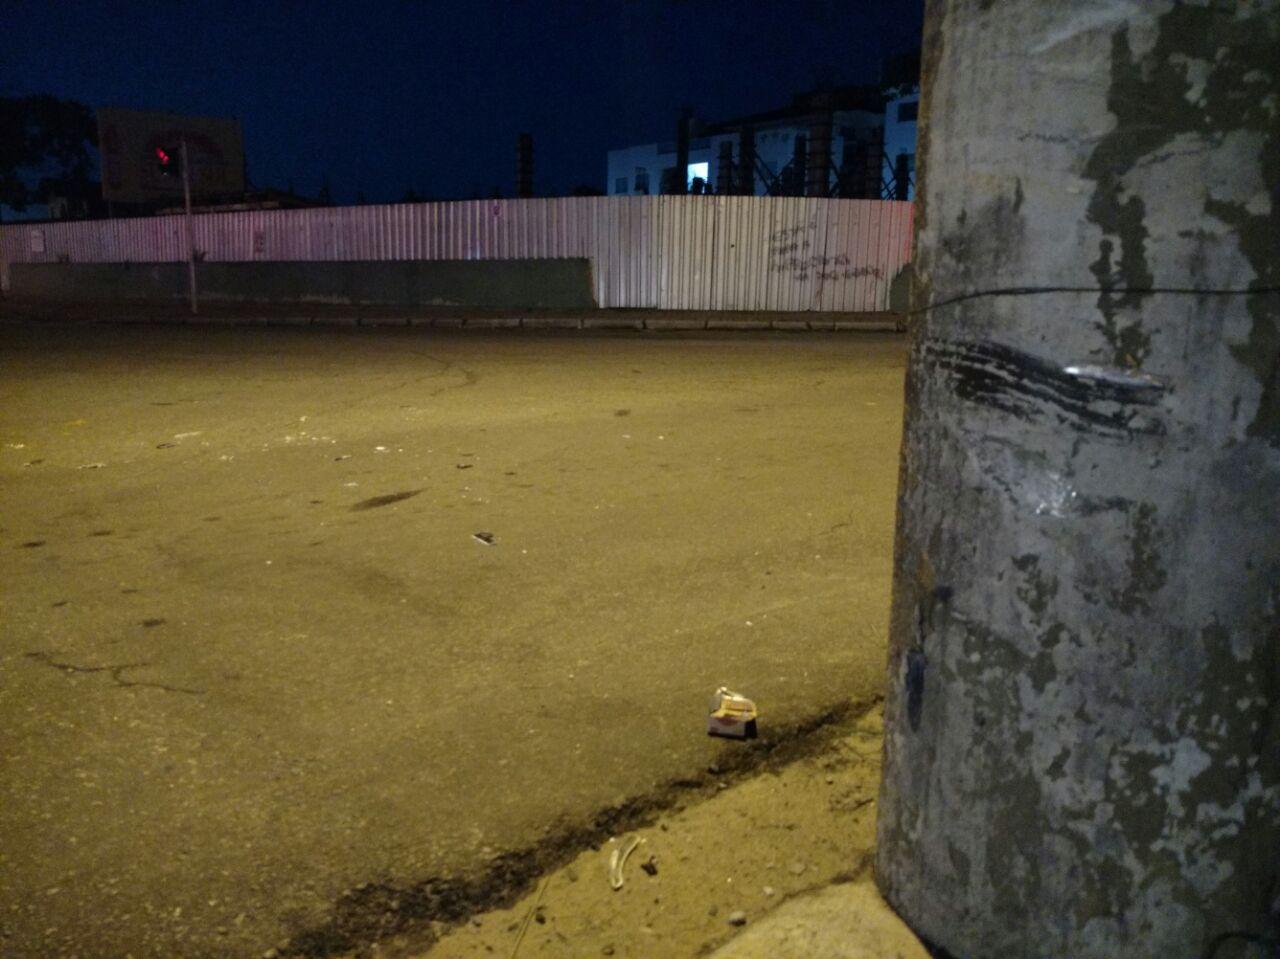 roubo-carro-argentino-perseguiçao-ingleses-canasvieiras-01